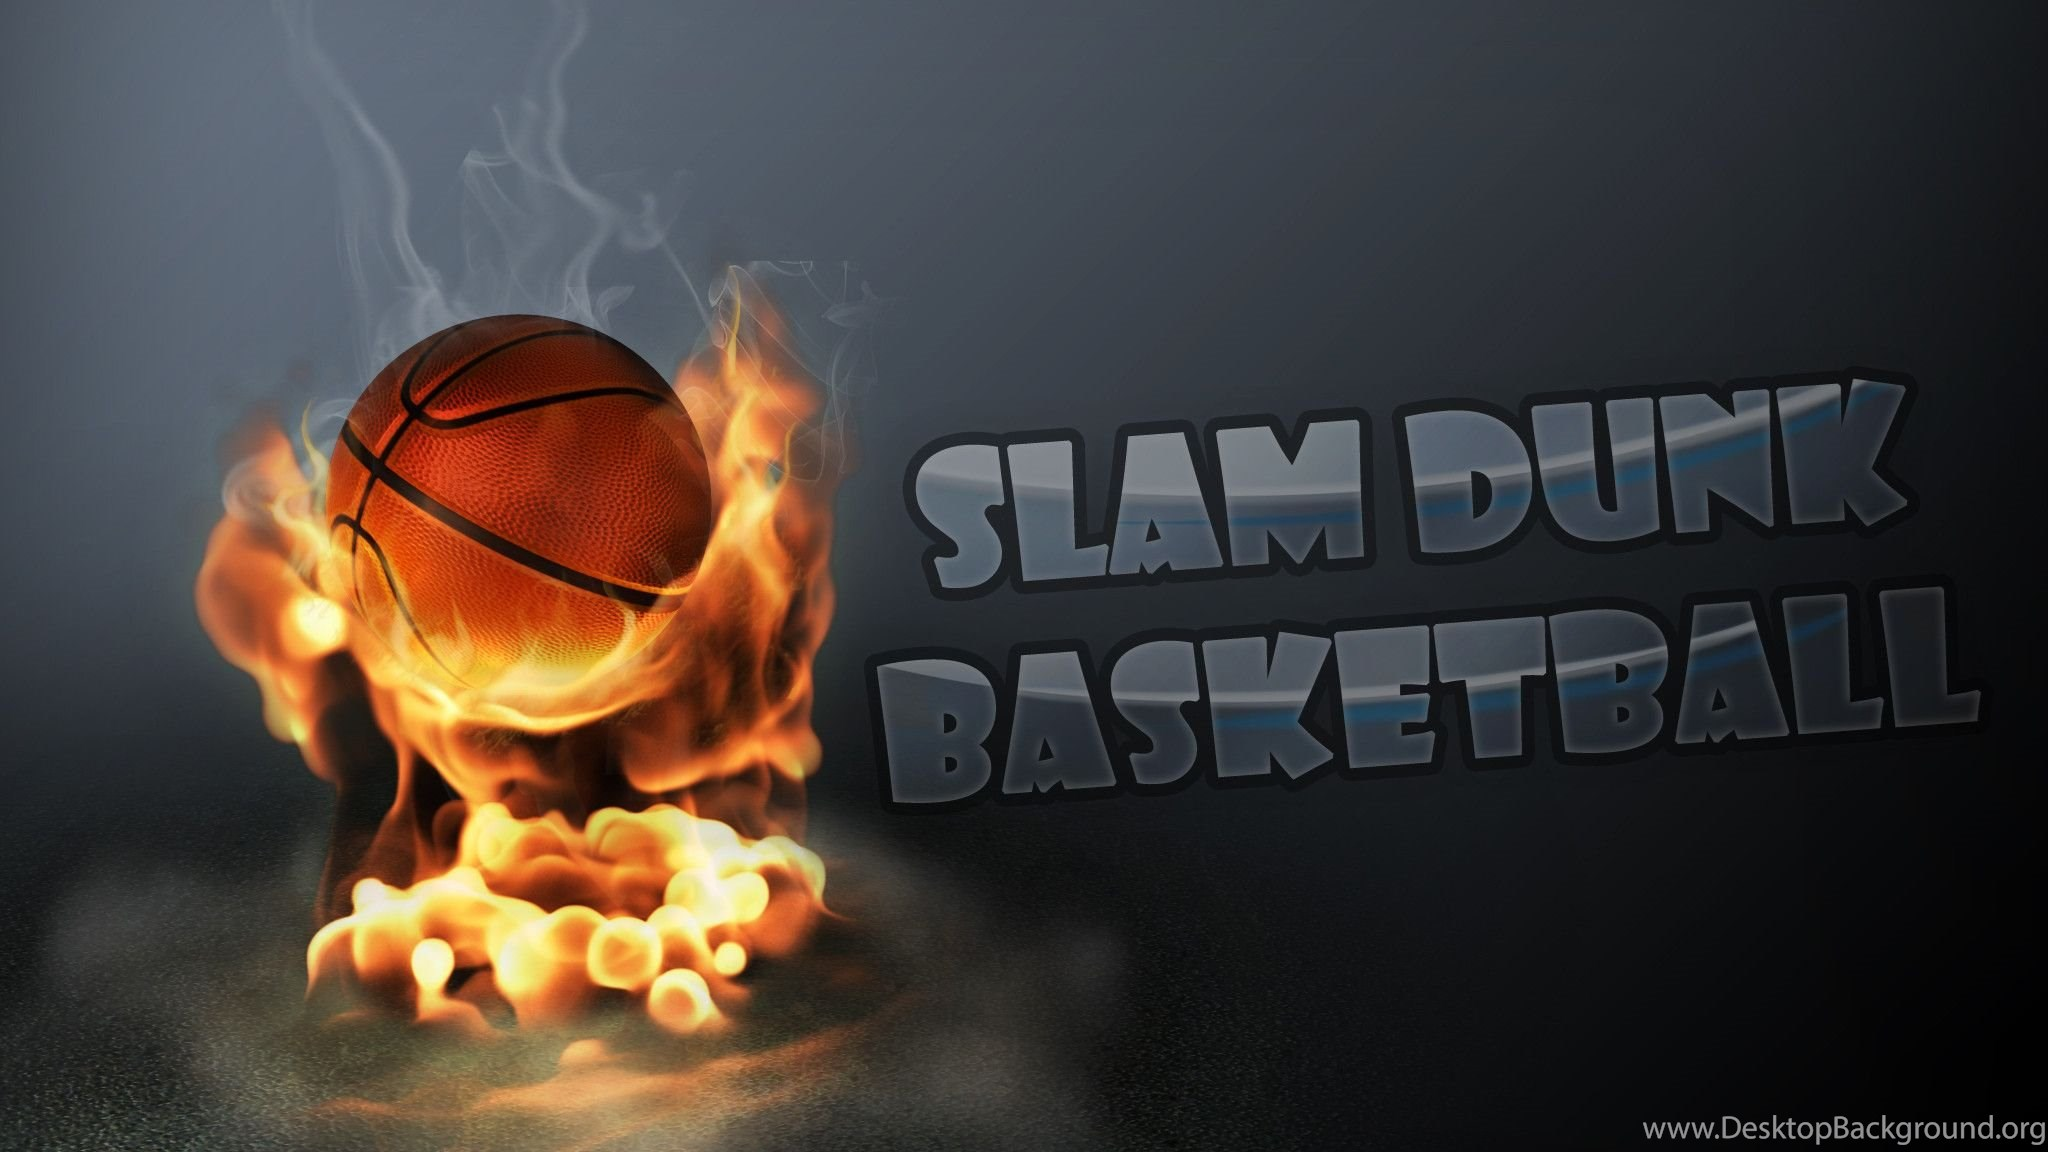 Fire Slam Dunk Basketball Wallpapers Picture 2 Desktop Background